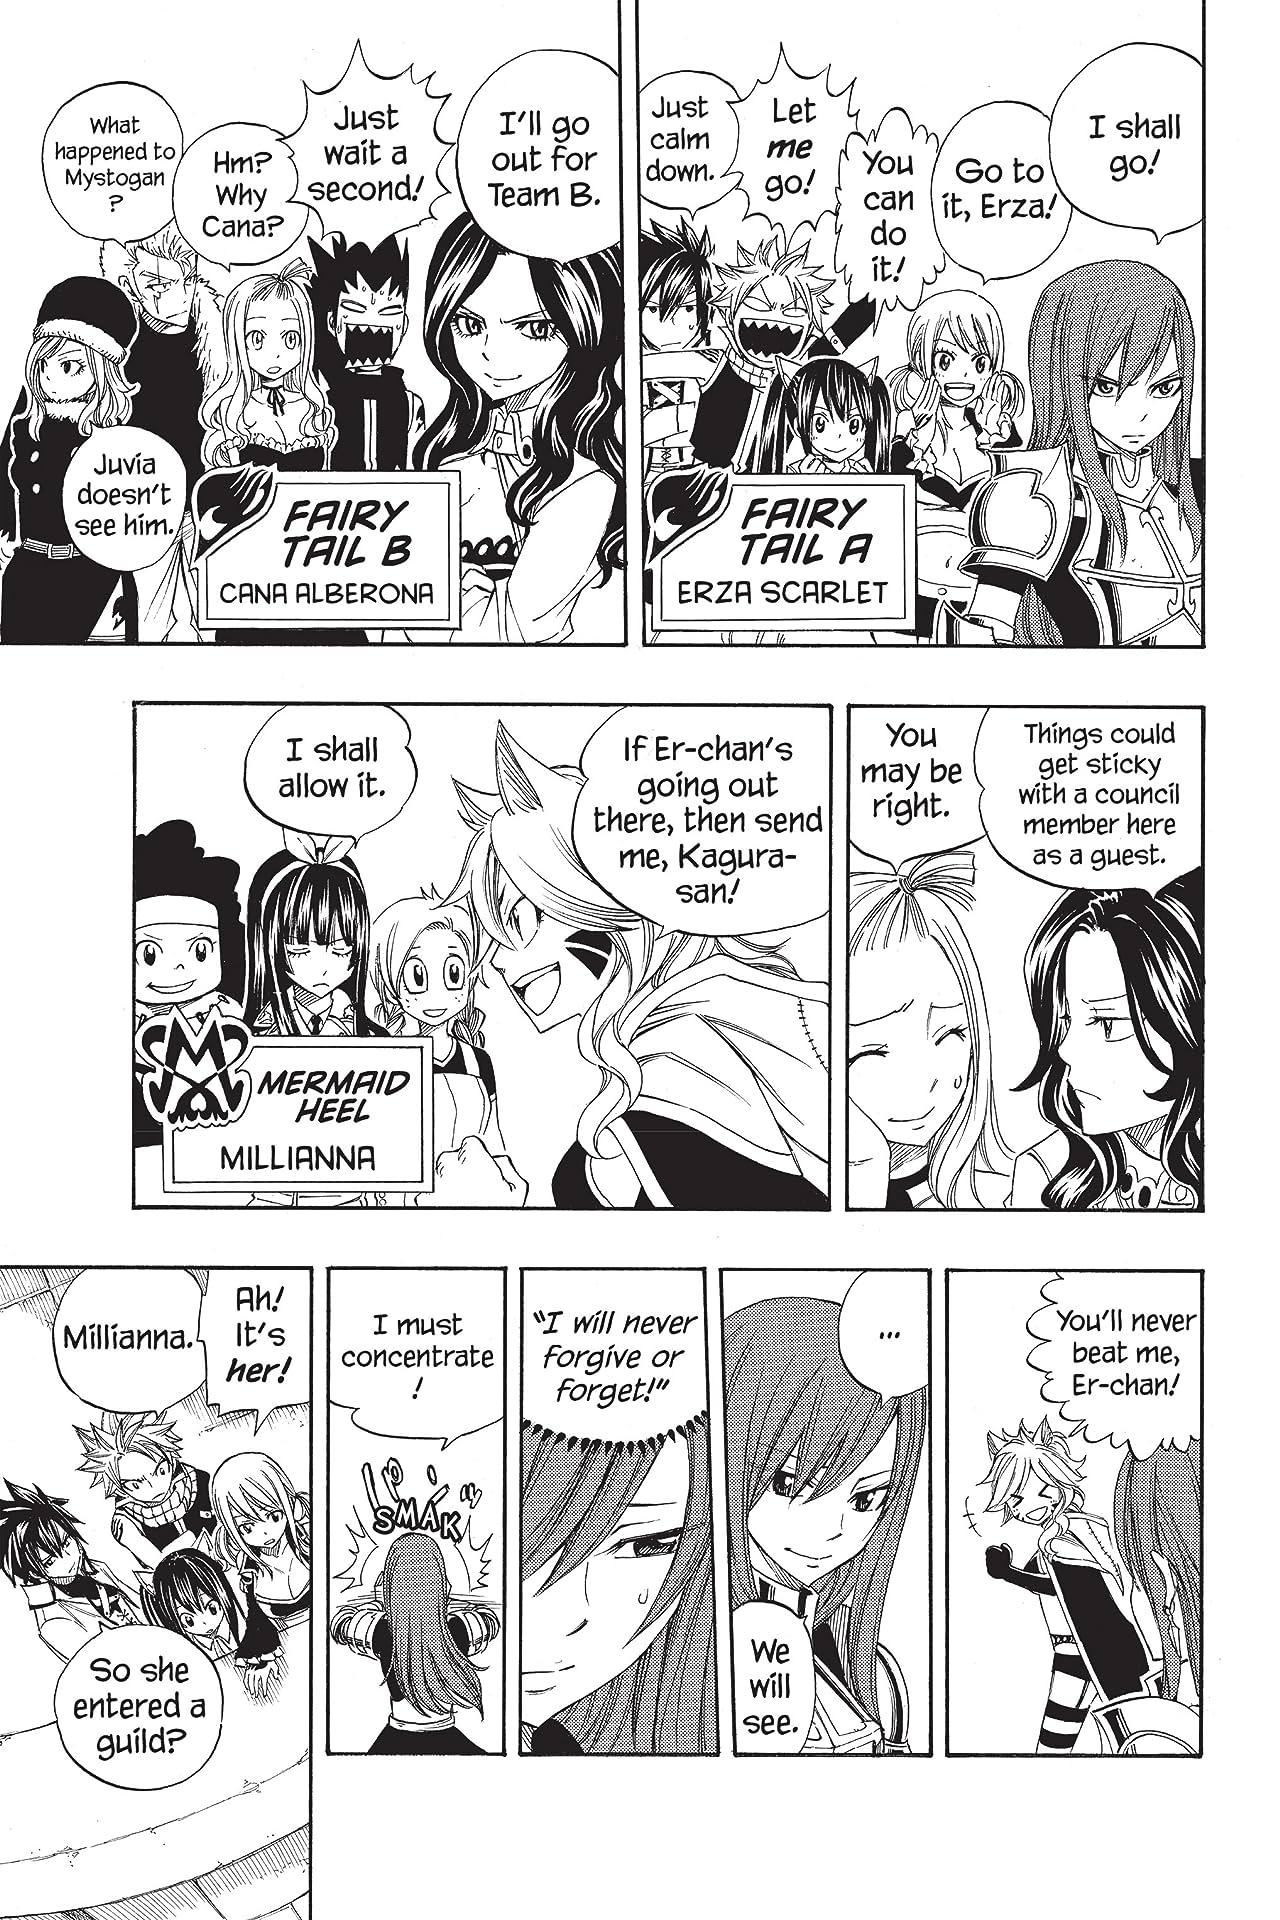 Fairy Tail #284